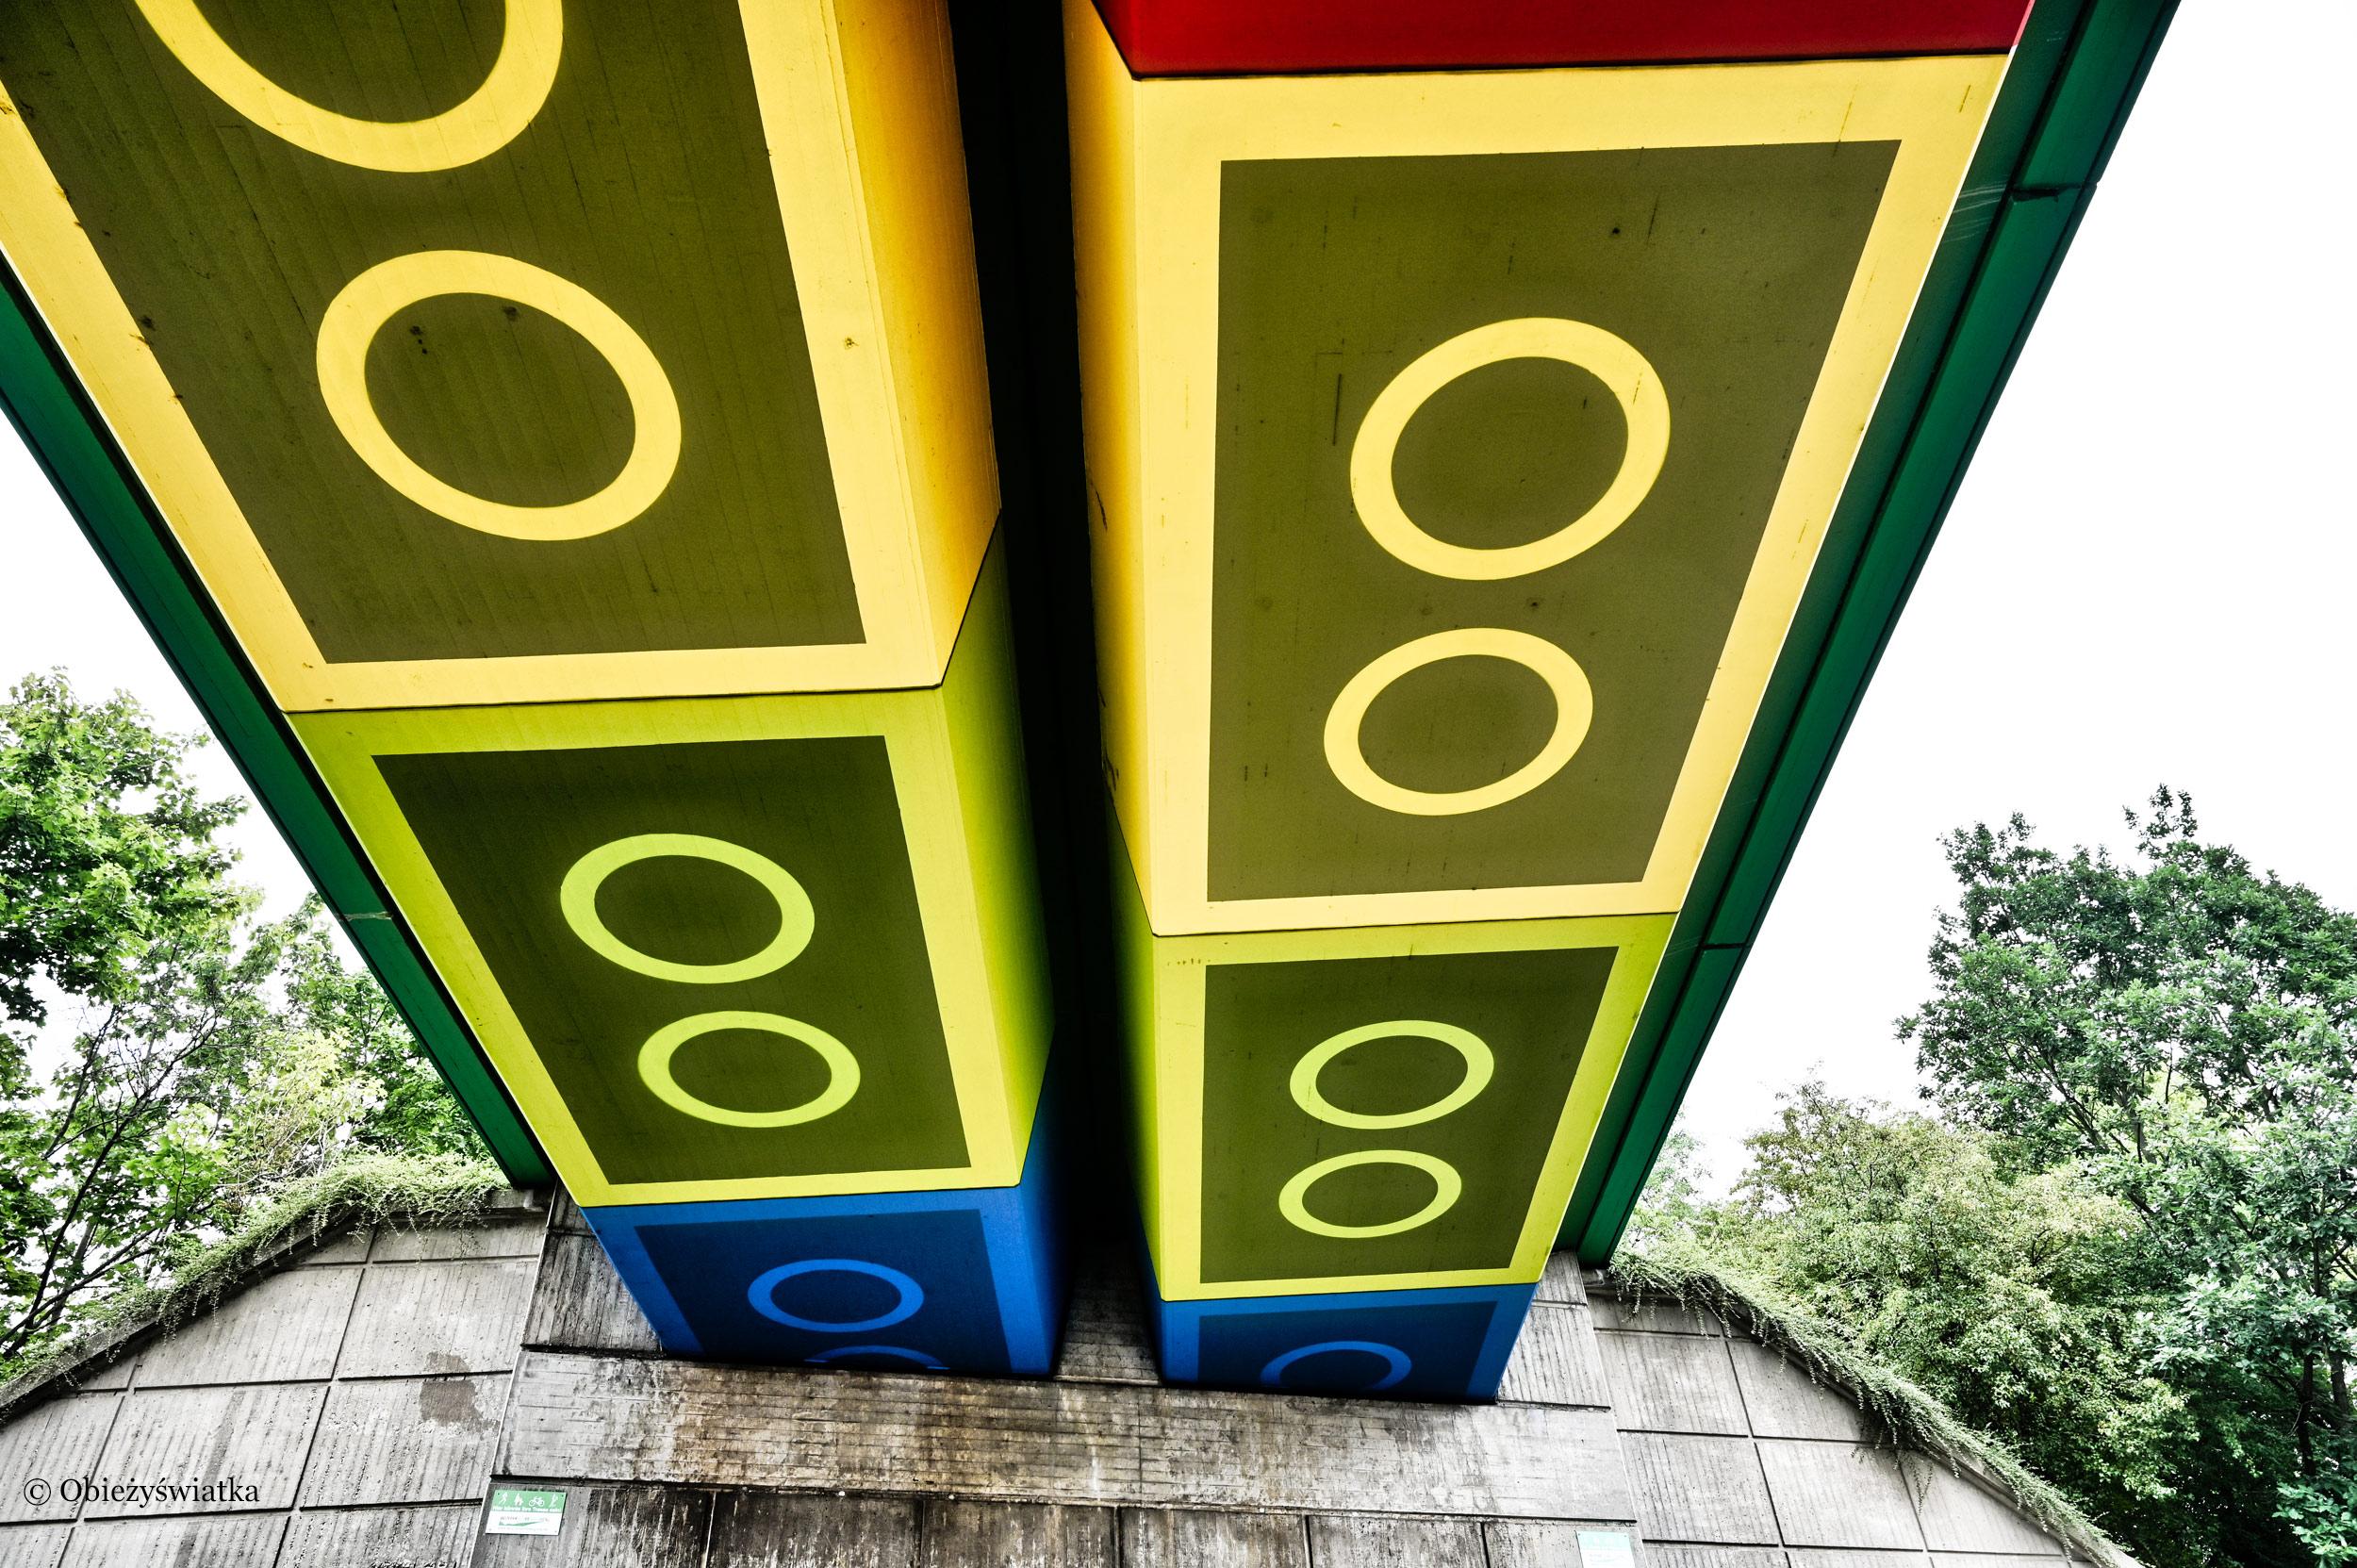 Klocki Lego i most, Wuppertal, Niemcy